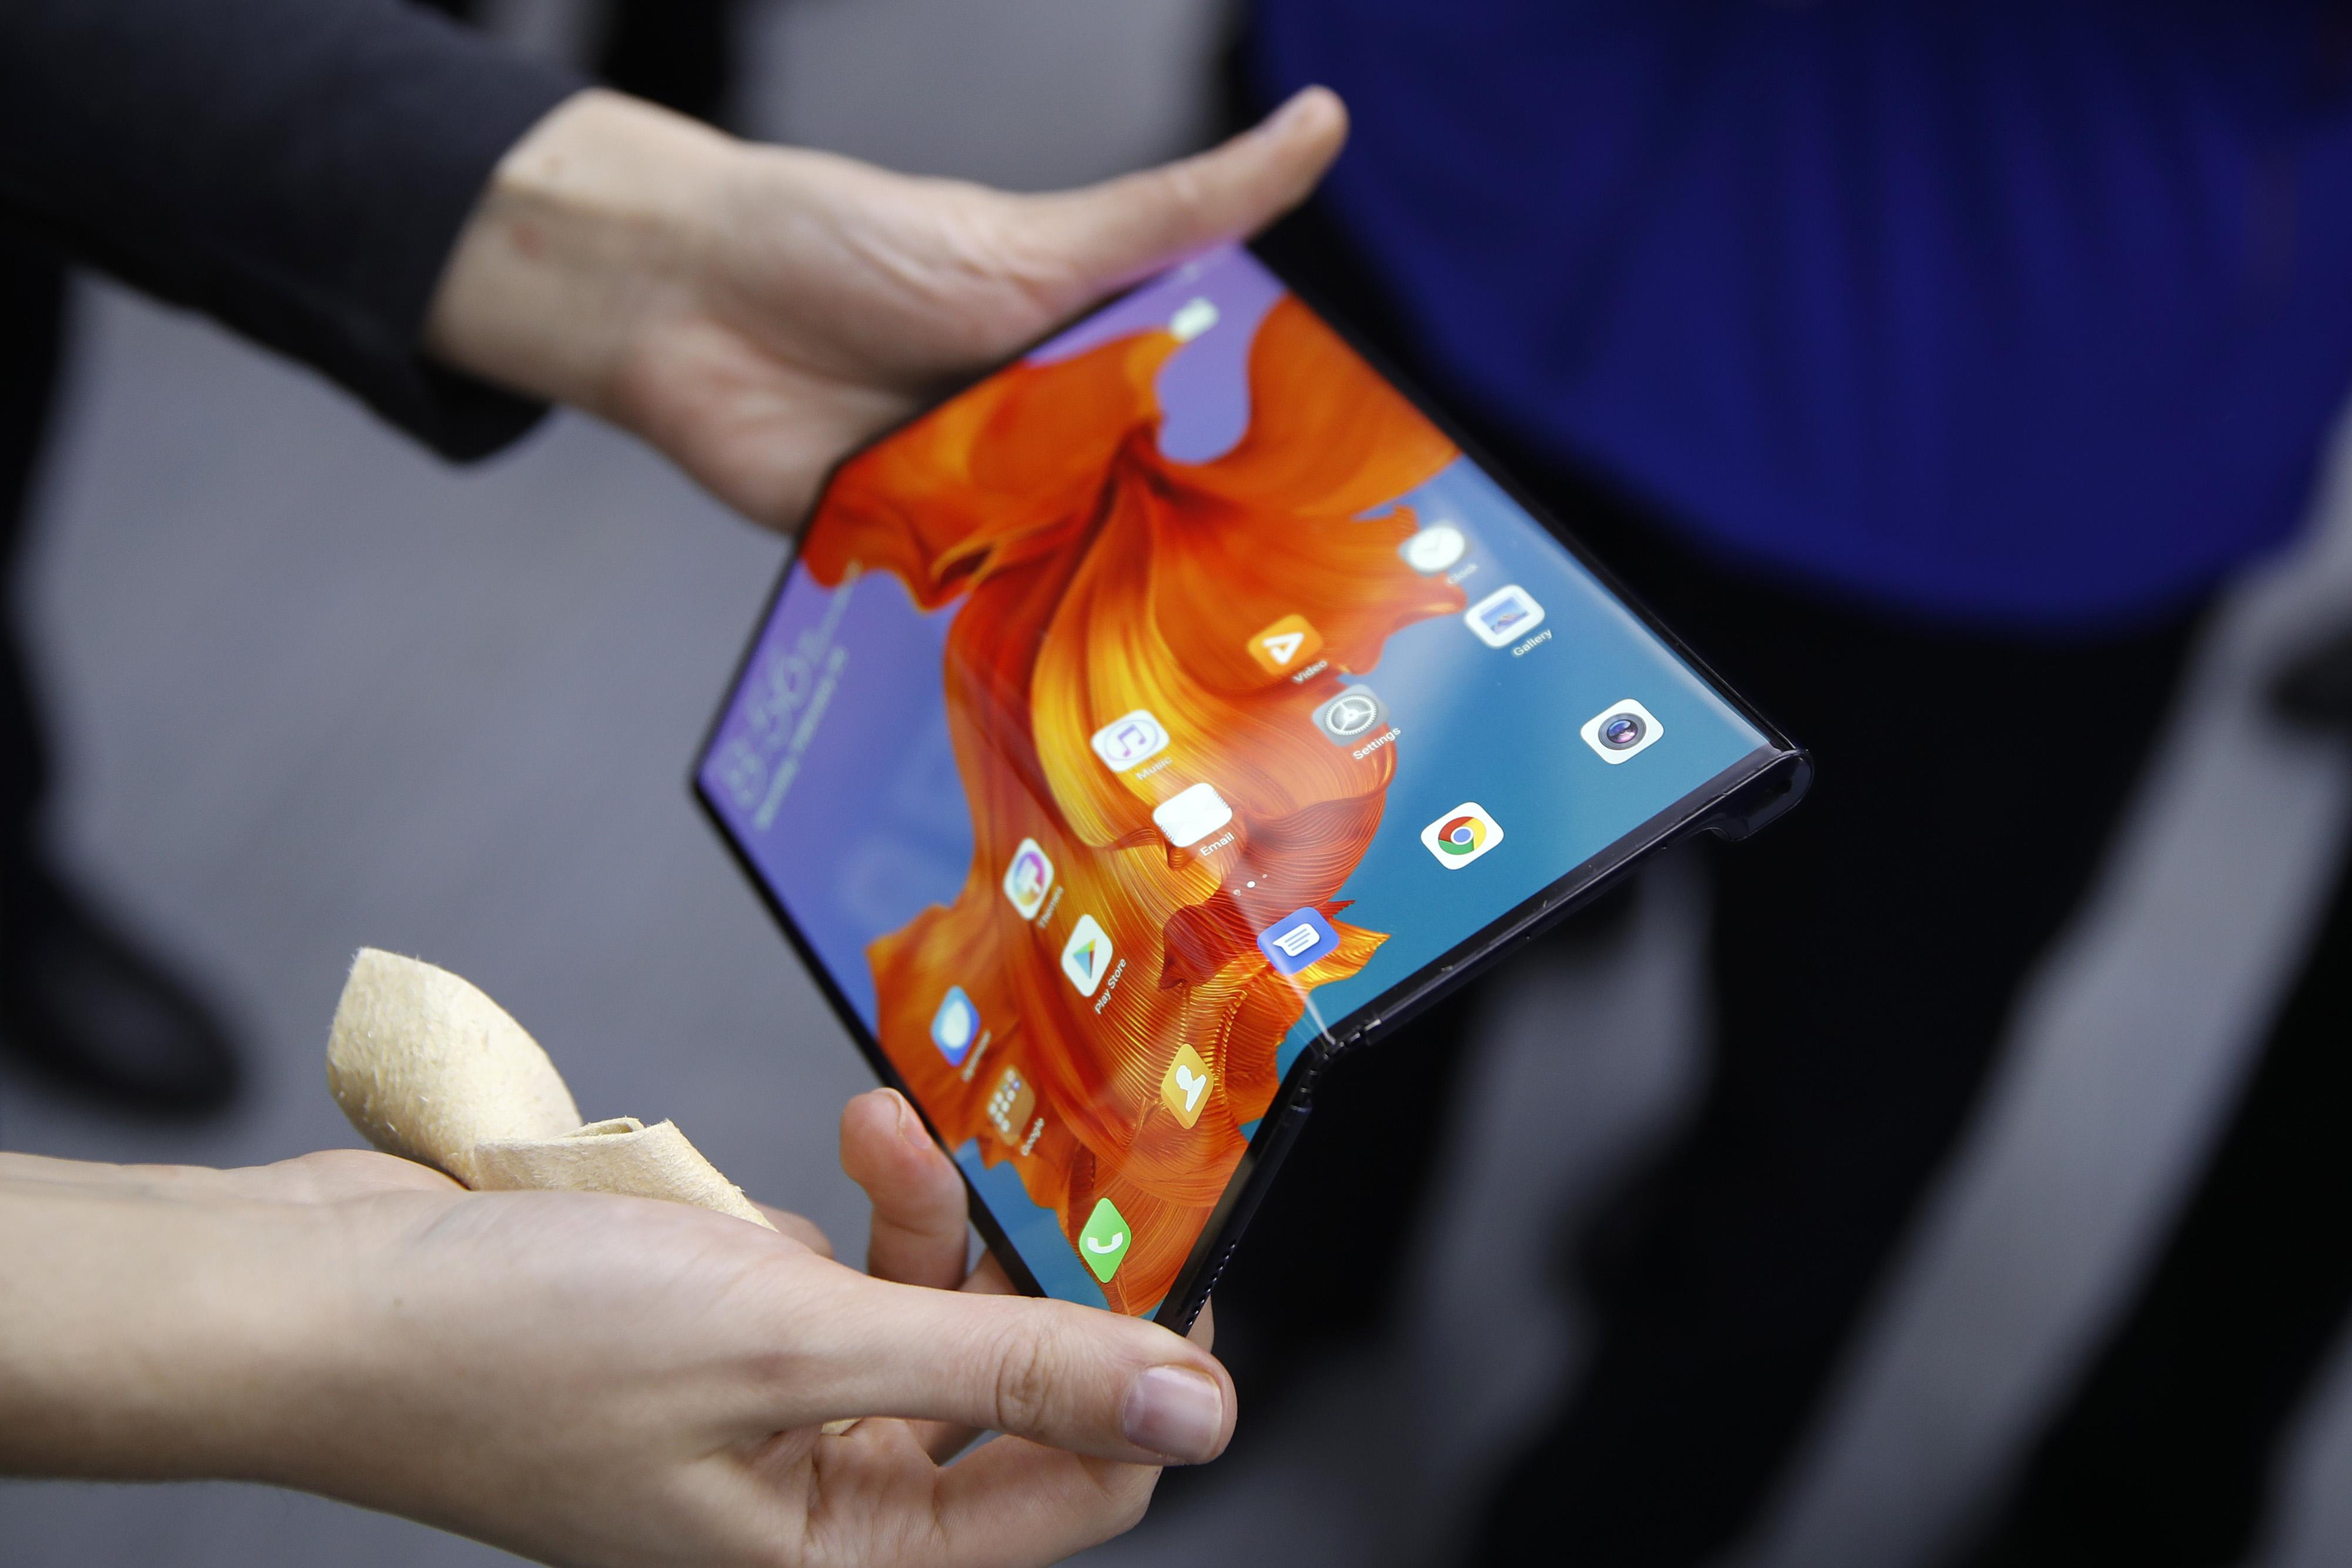 bloomberg.com - Stefan Nicola - Trump Blockade of Huawei Fizzles in European 5G Rollout